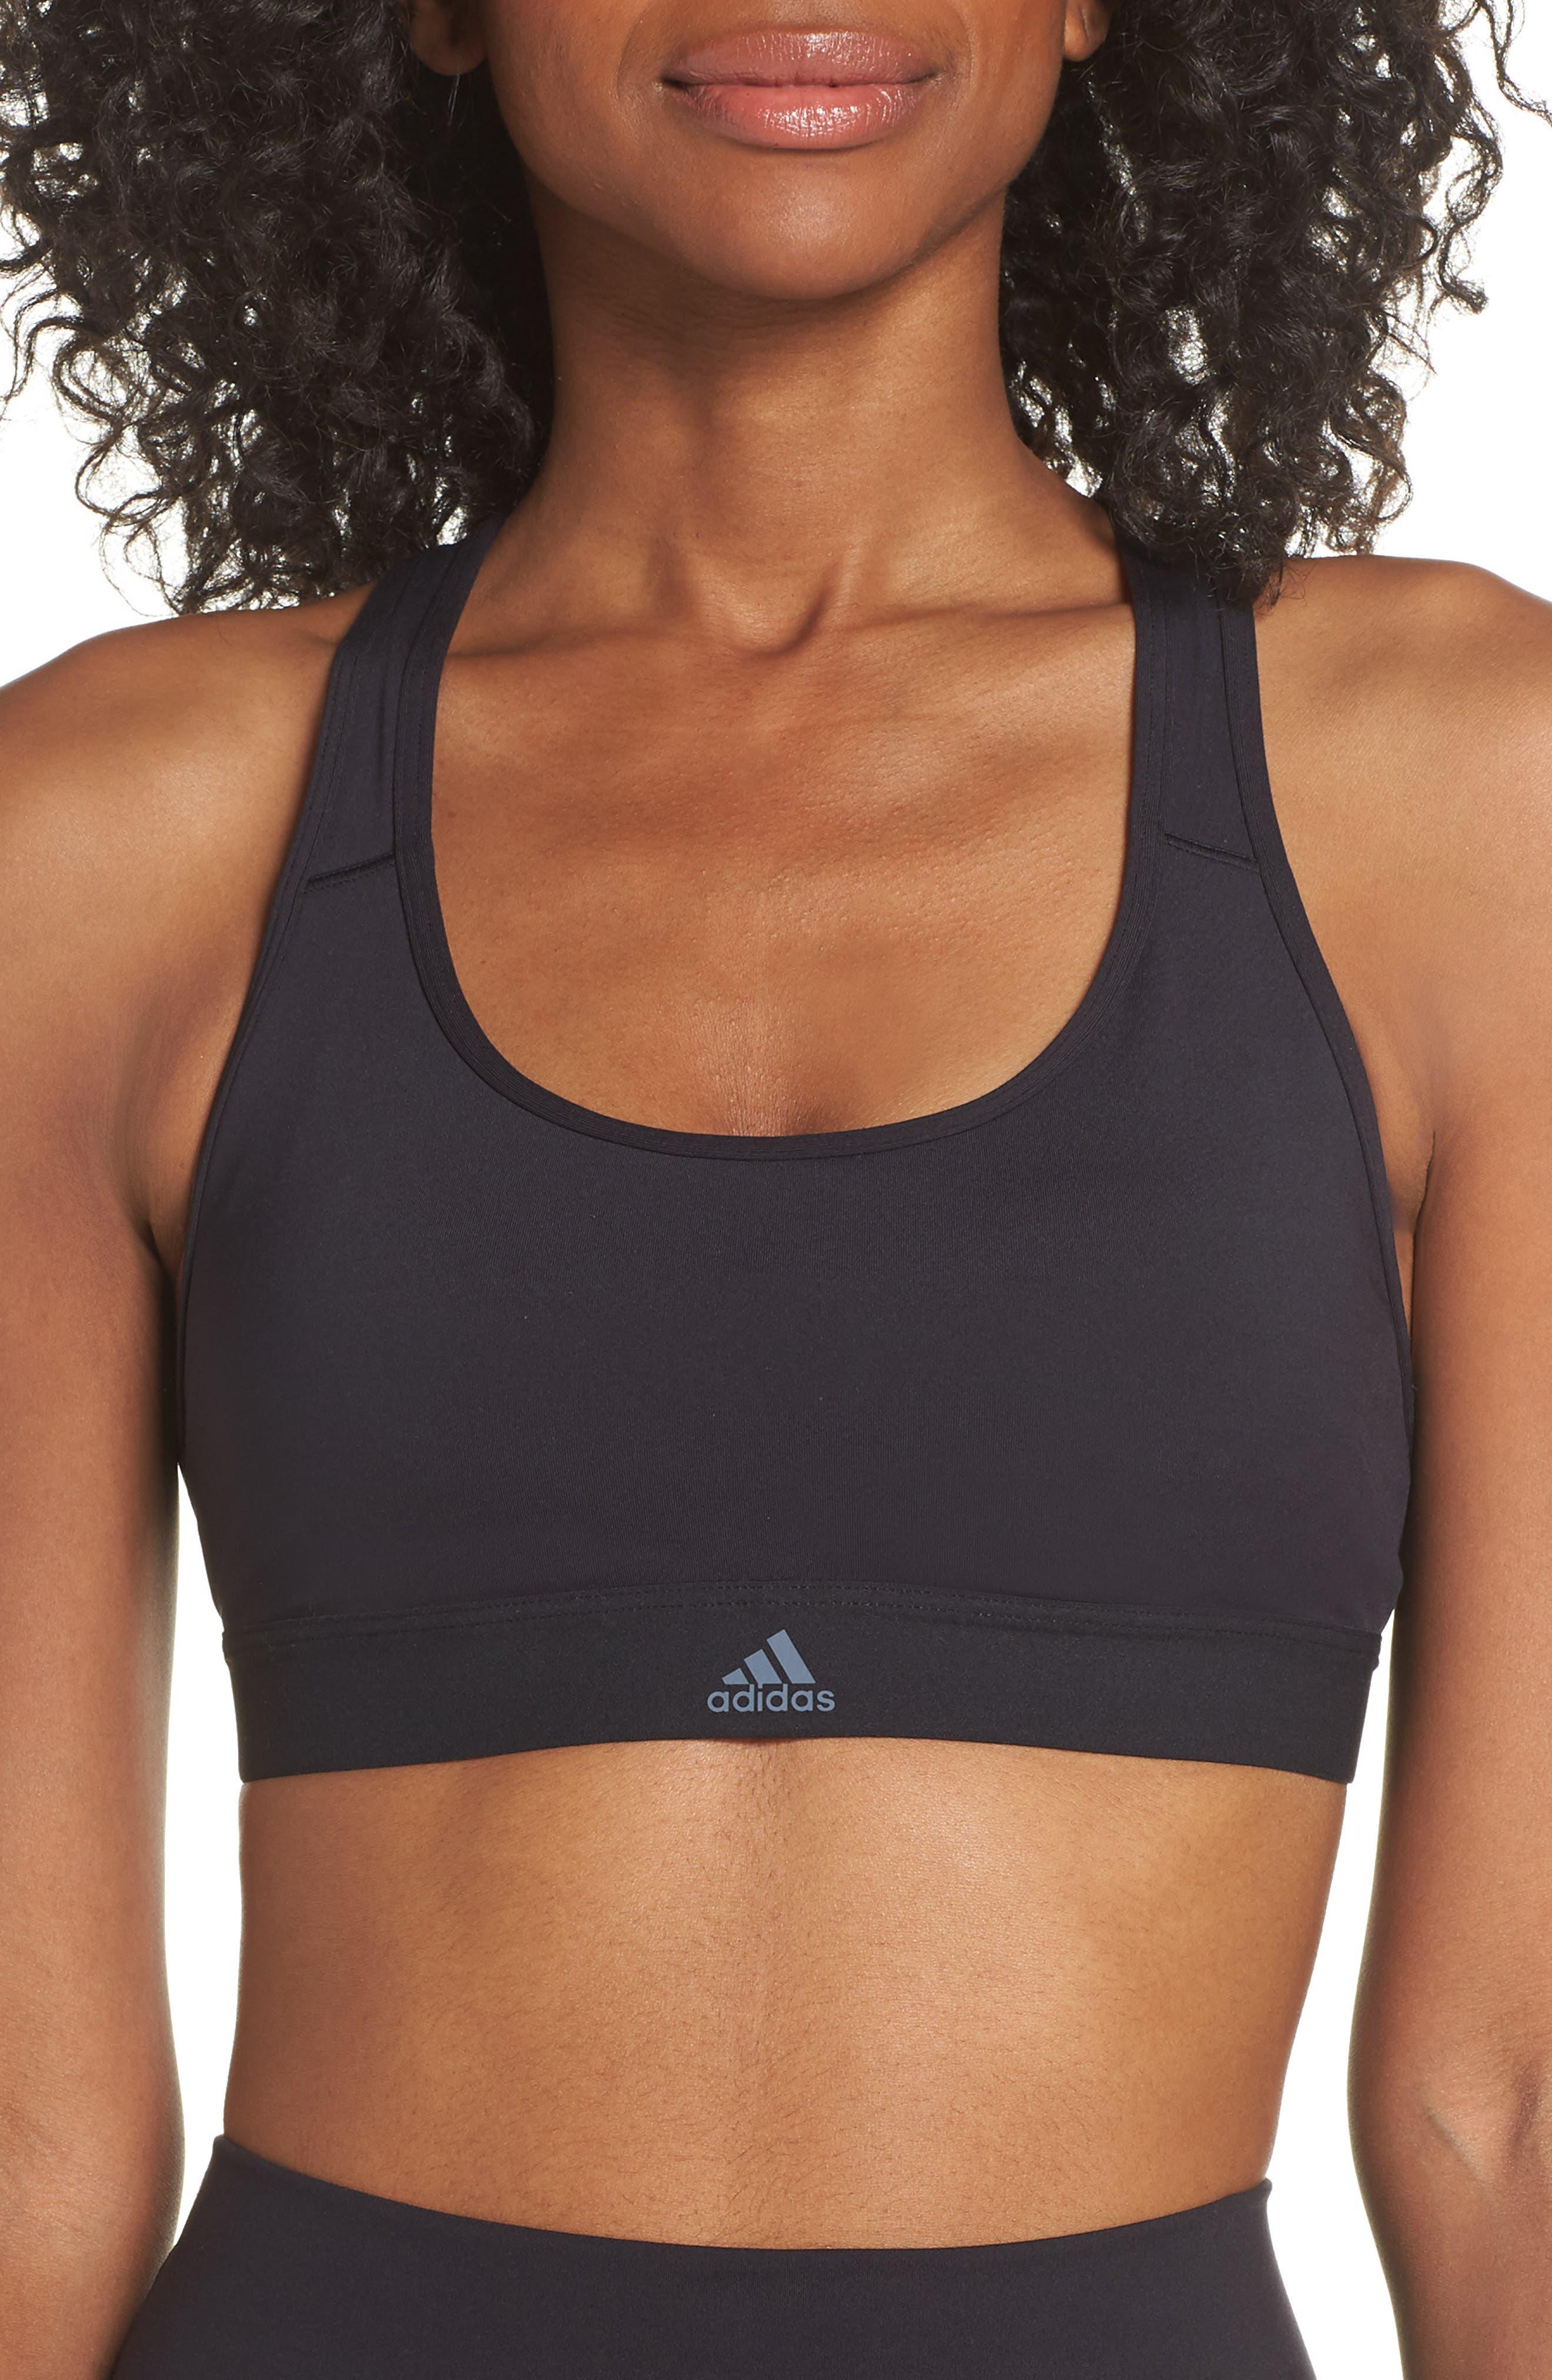 6d72ea0d33a59 Women s Adidas Workout Clothes   Activewear